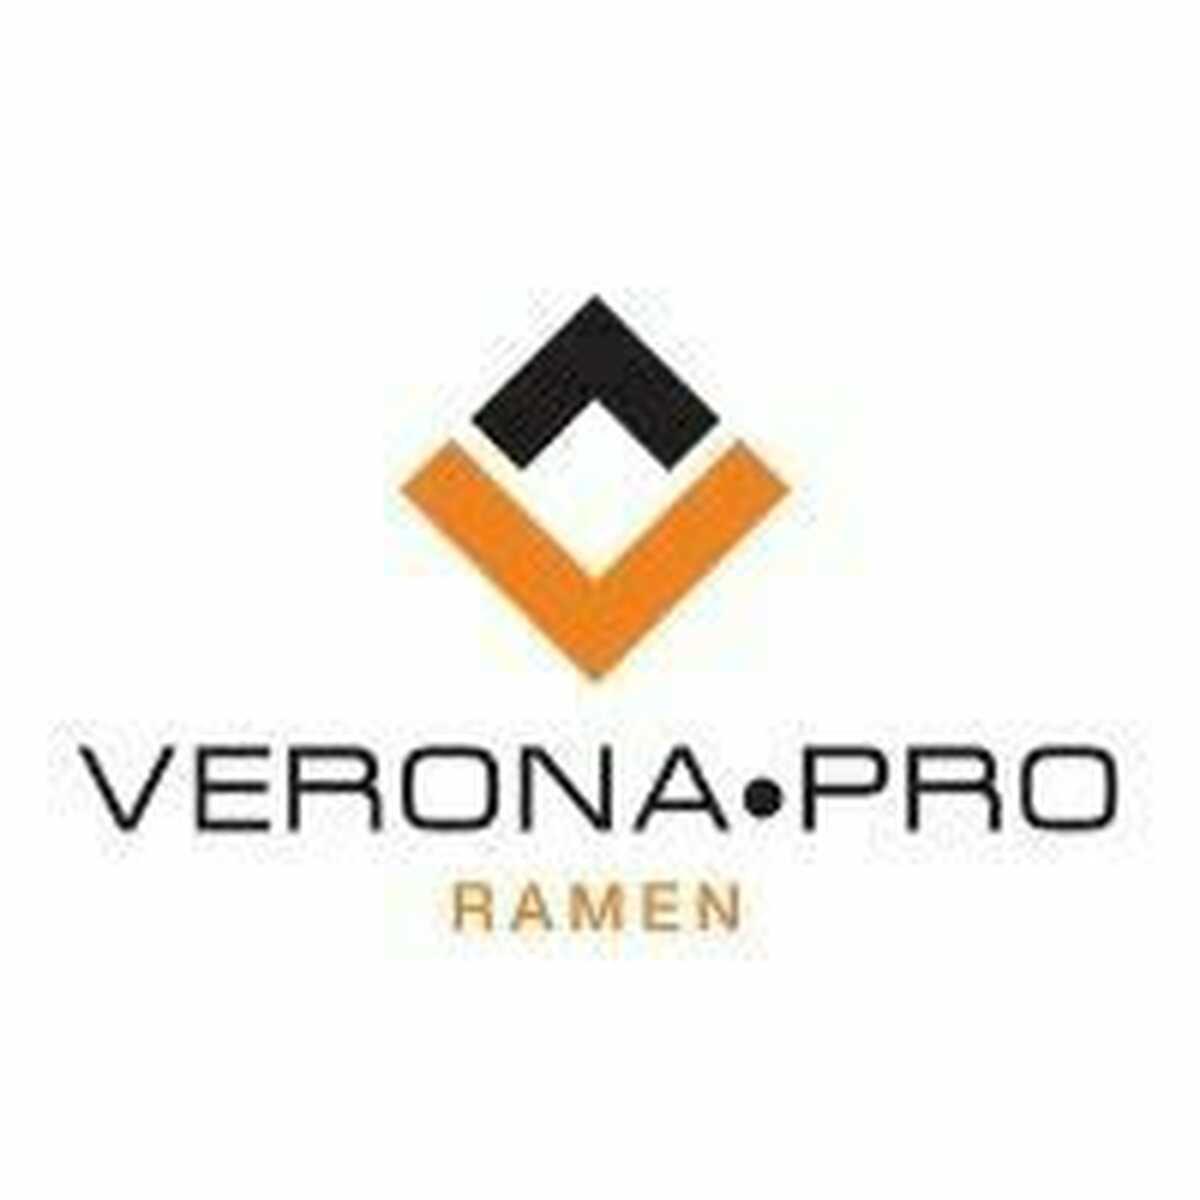 Verona pro ramen